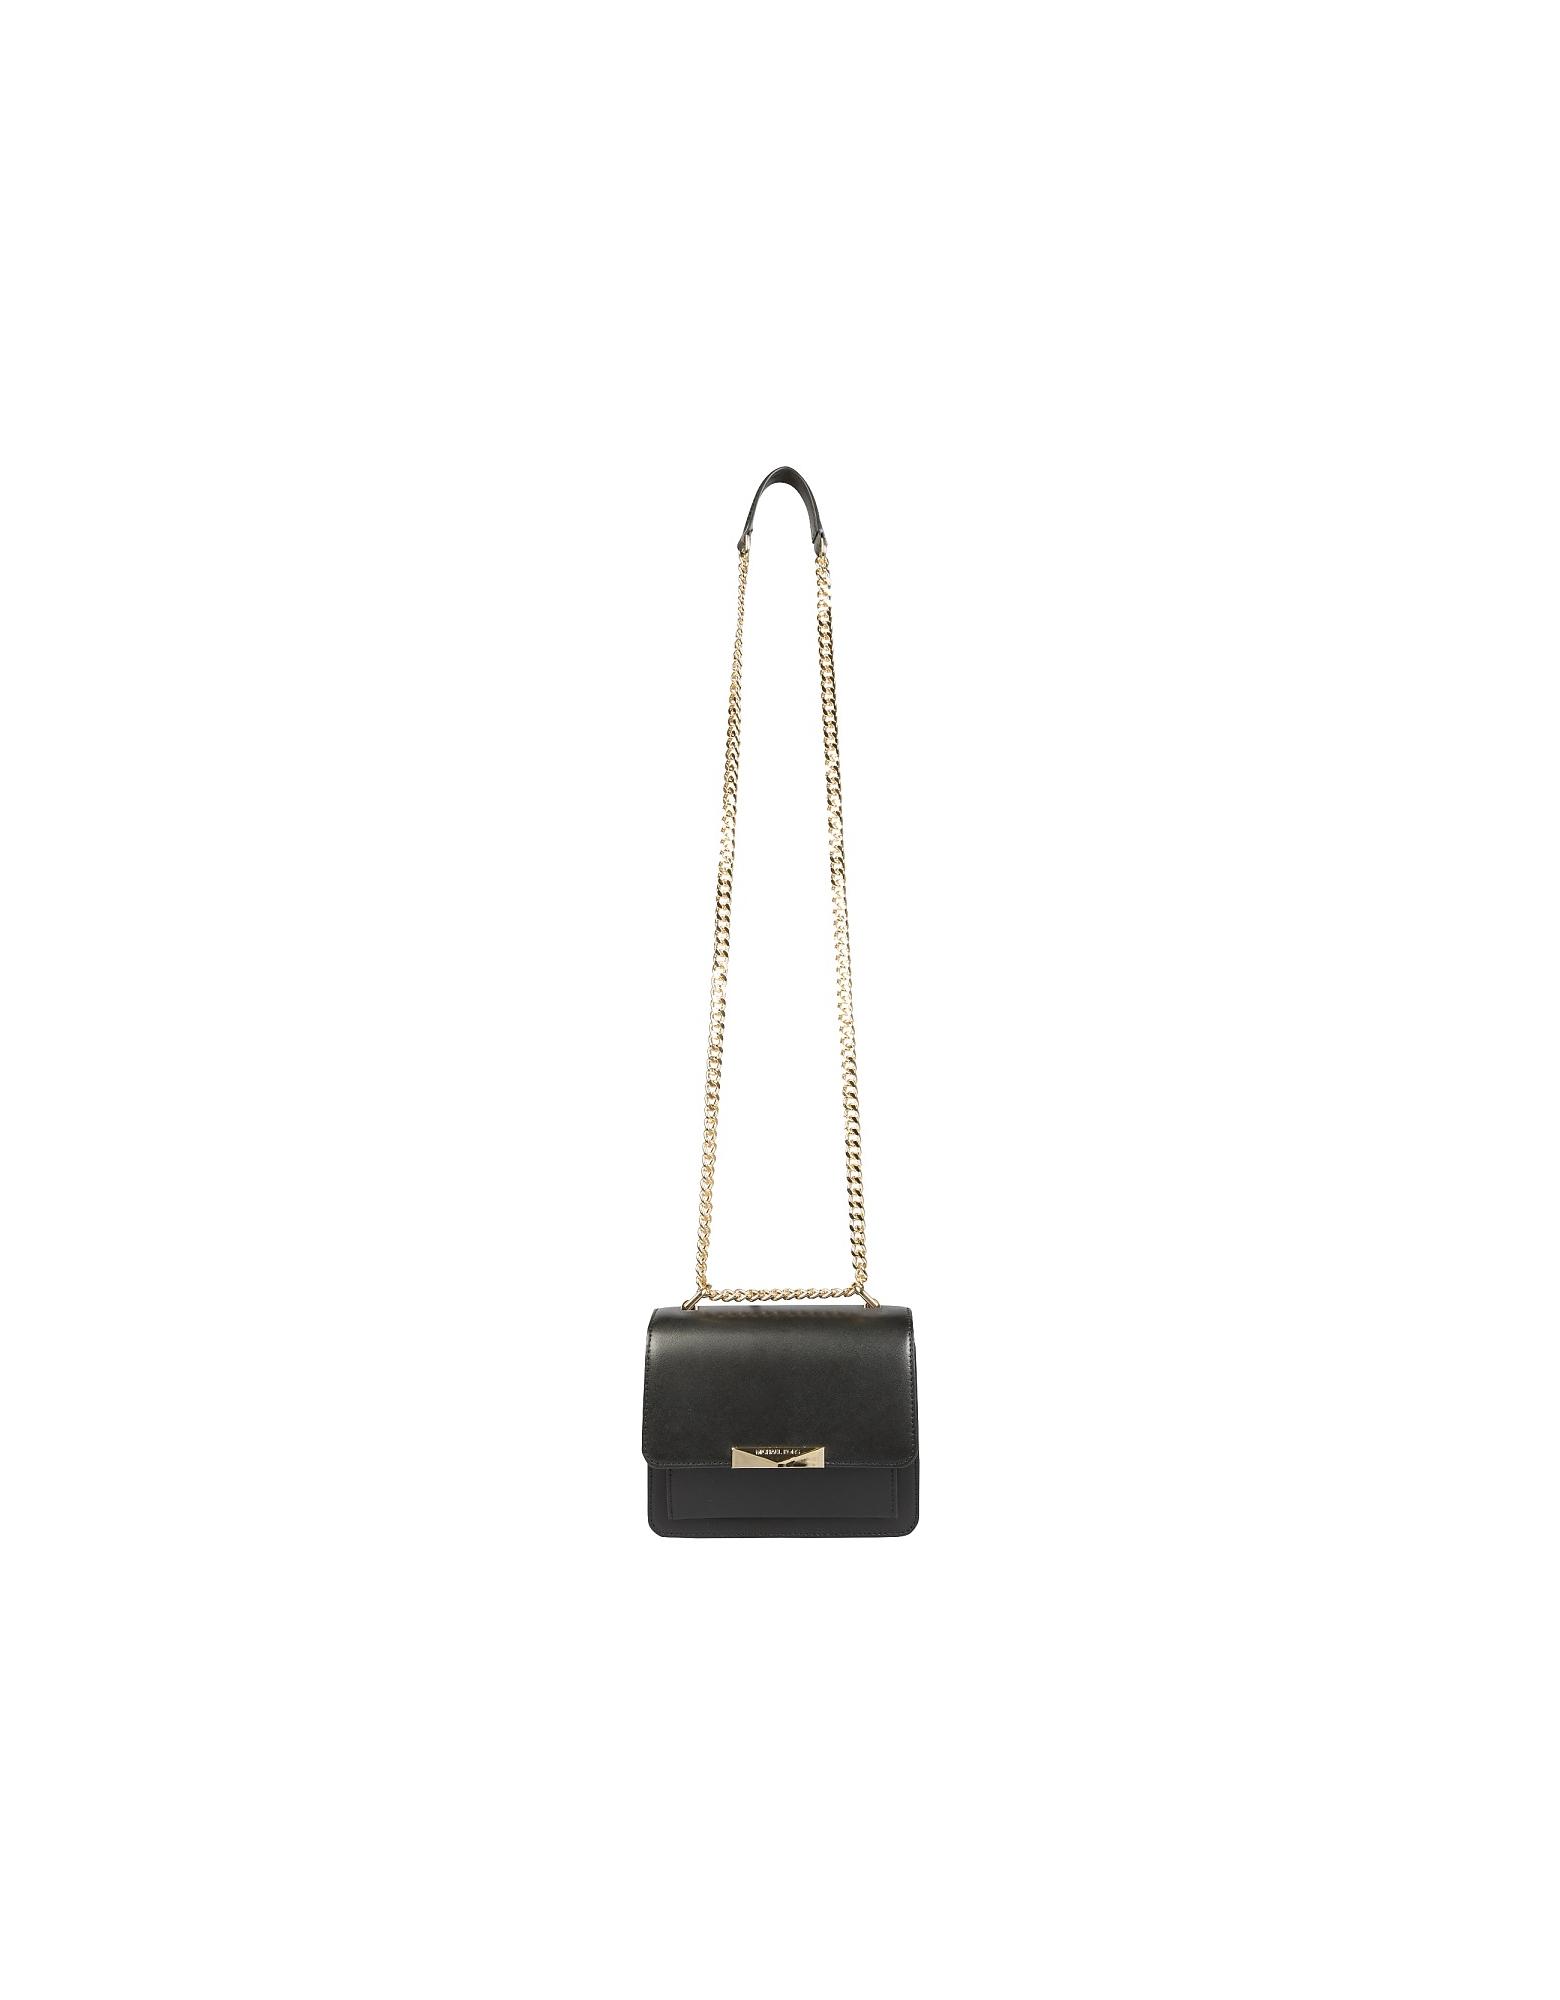 Michael Kors Designer Handbags, Small